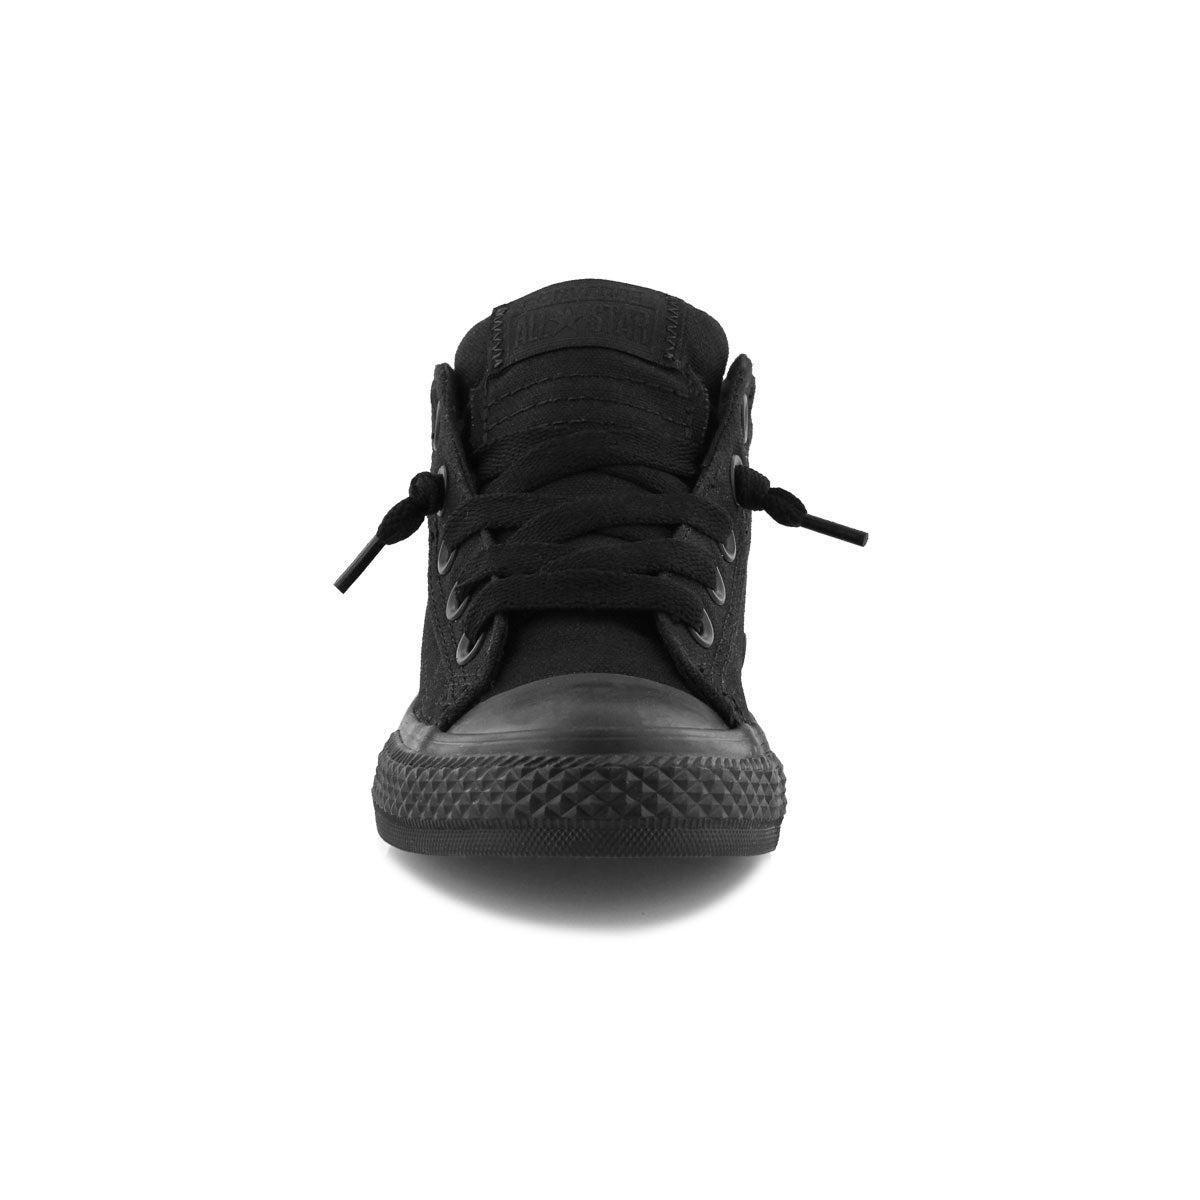 Kds CTAS Street Mid Core black sneaker